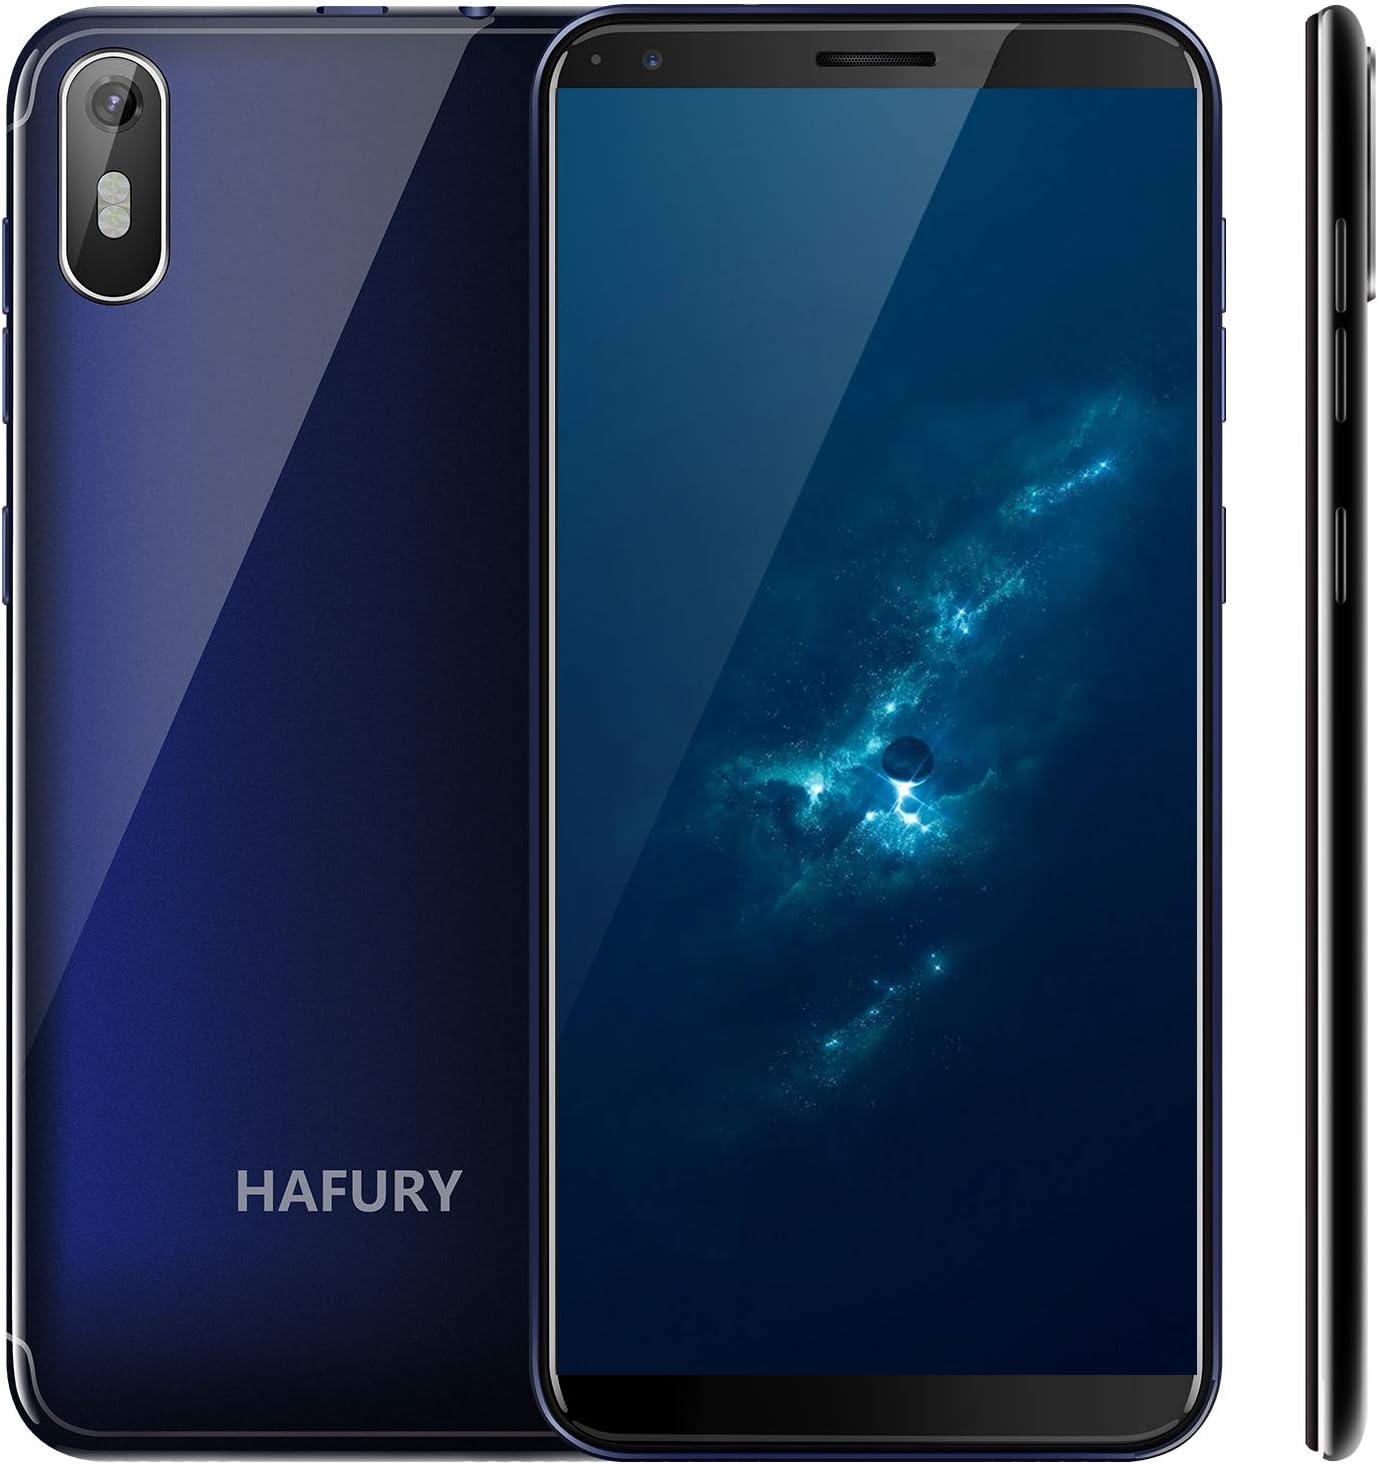 Hafury A7 (2019) Android 9.0 Smartphone Libre con 5.5 Pulgadas (18:9) Pantalla táctil, Dual SIM Dual Standby, 2GB RAM 16GB Almacenamiento, 8MP cámara trasera/5MP cámara Frontal (Azul): Amazon.es: Electrónica